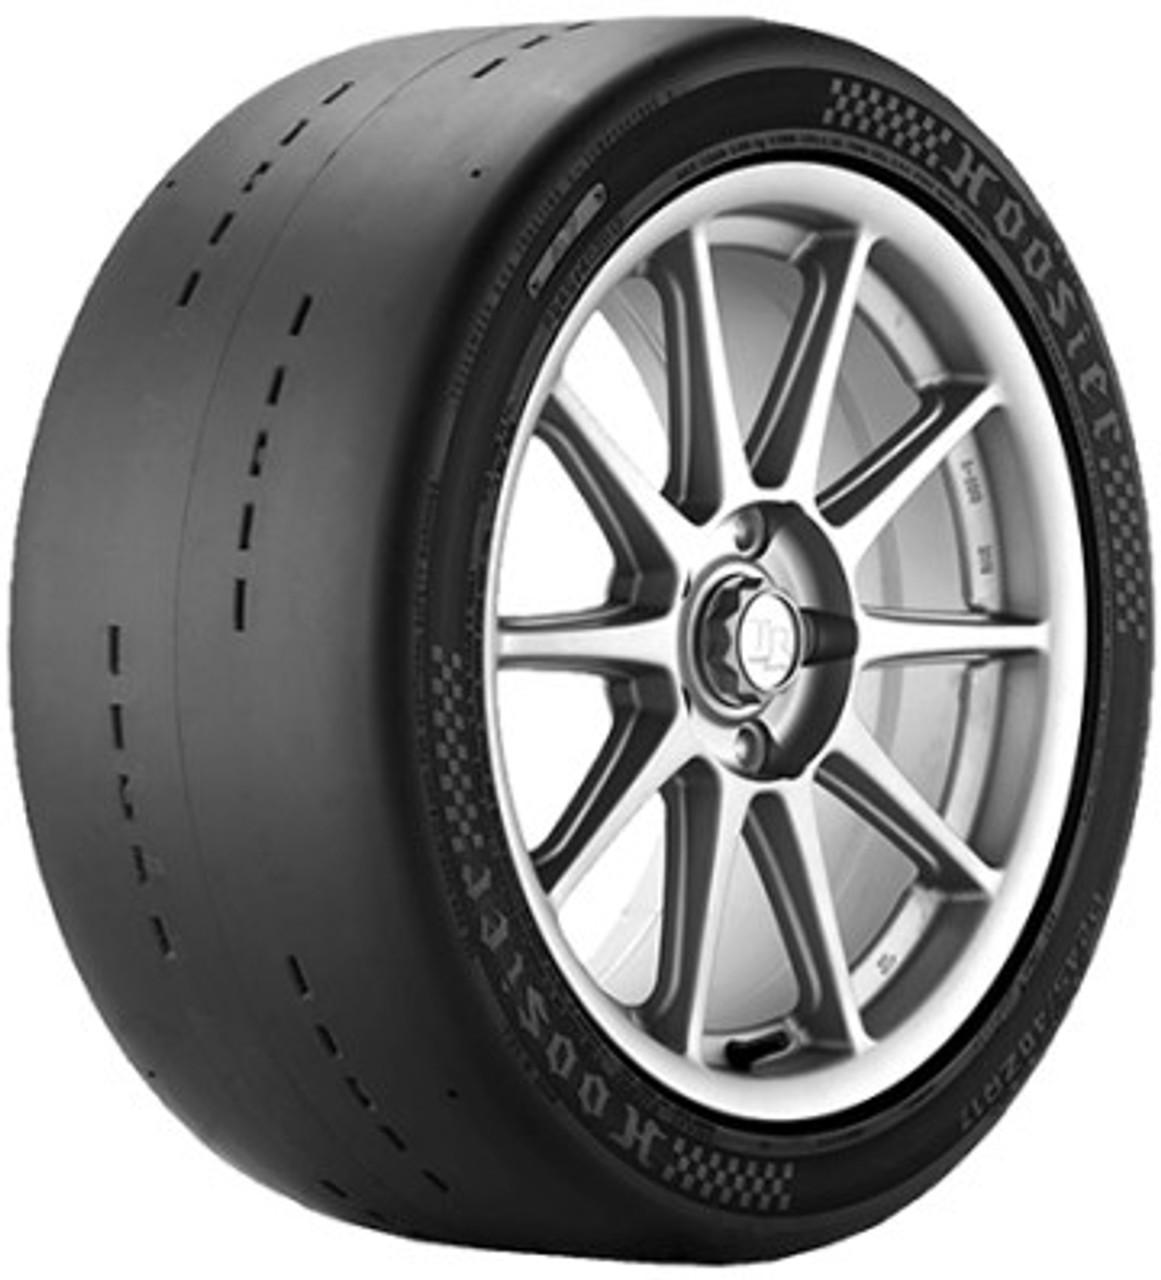 Hoosier Circuit Racing Tire